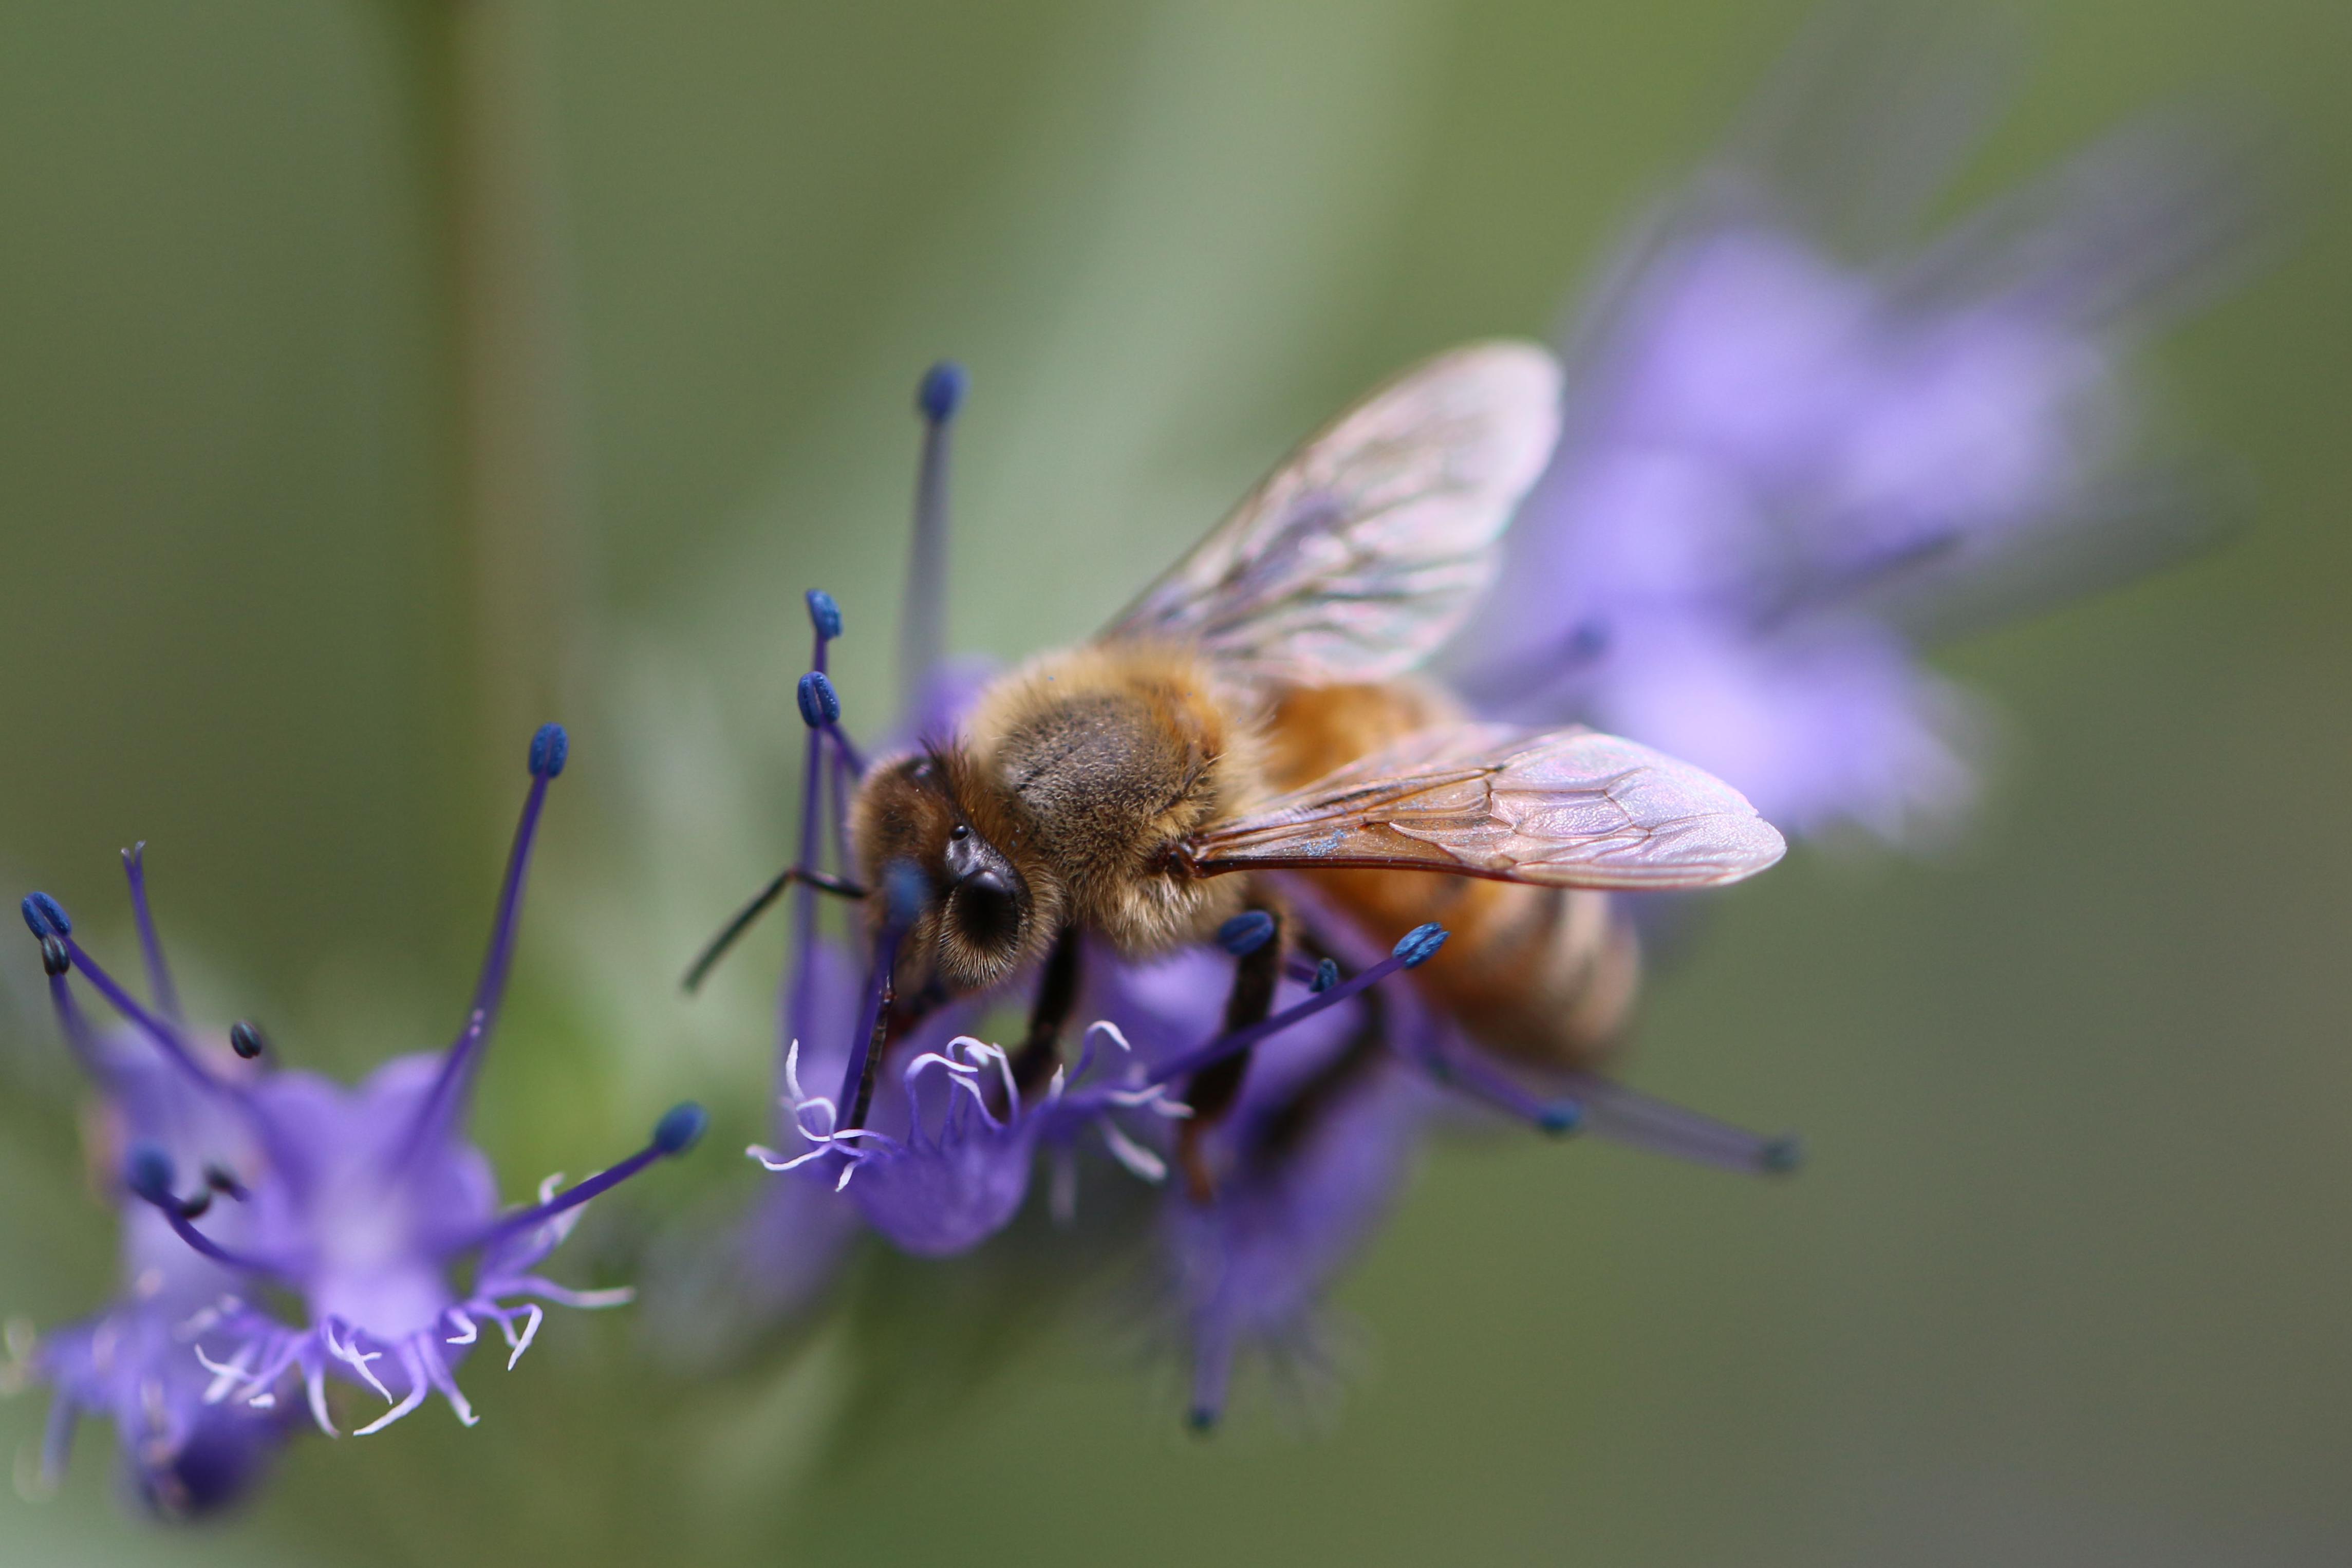 Honey bee on the flower of Caryopteris